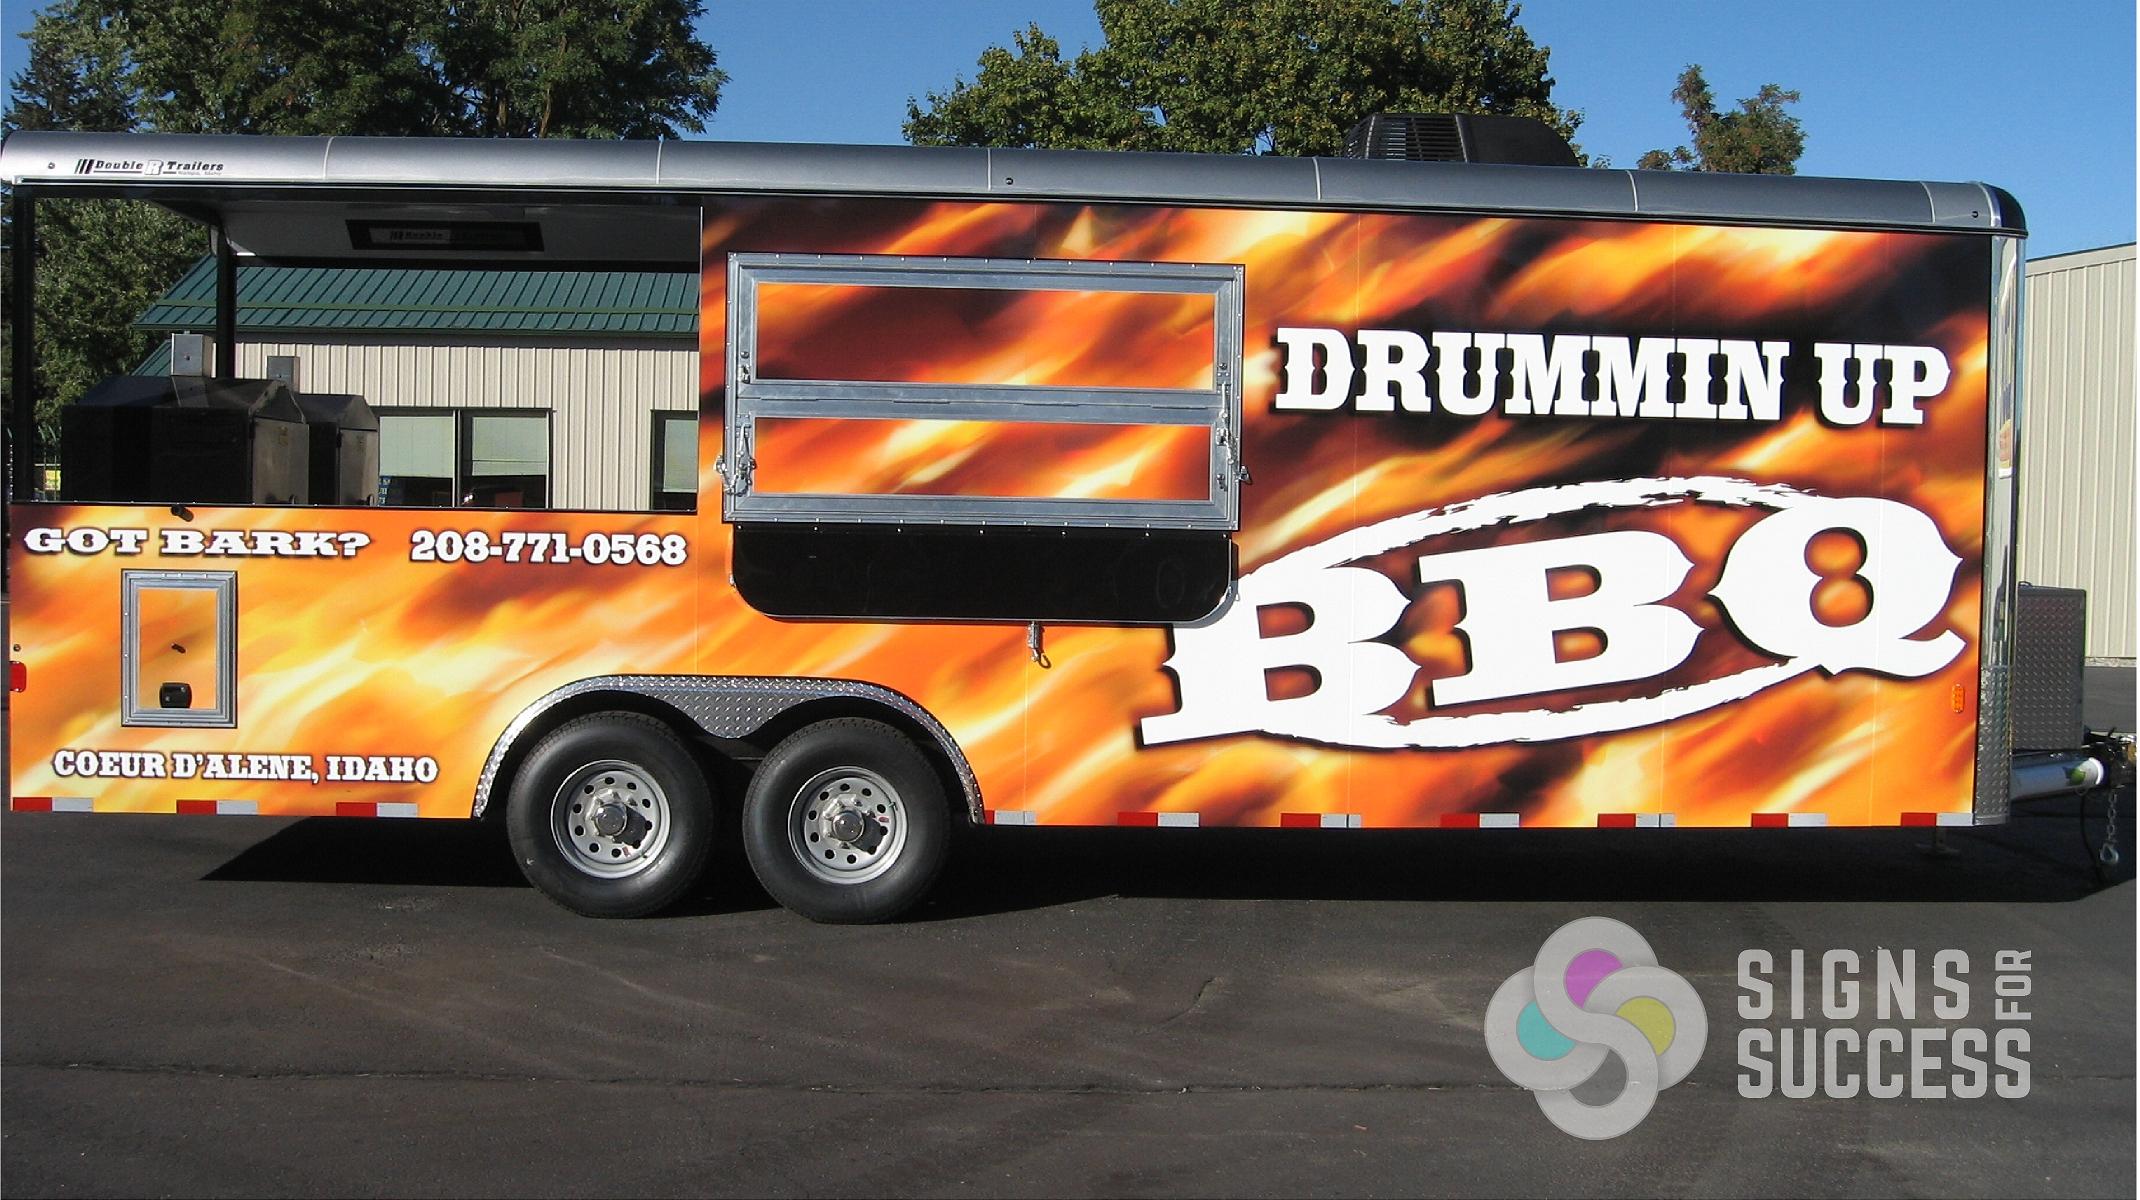 Top Logo Design realtor logo design : Drummin Up BBQ Custom Concession Trailer Wrap - Signs for ...